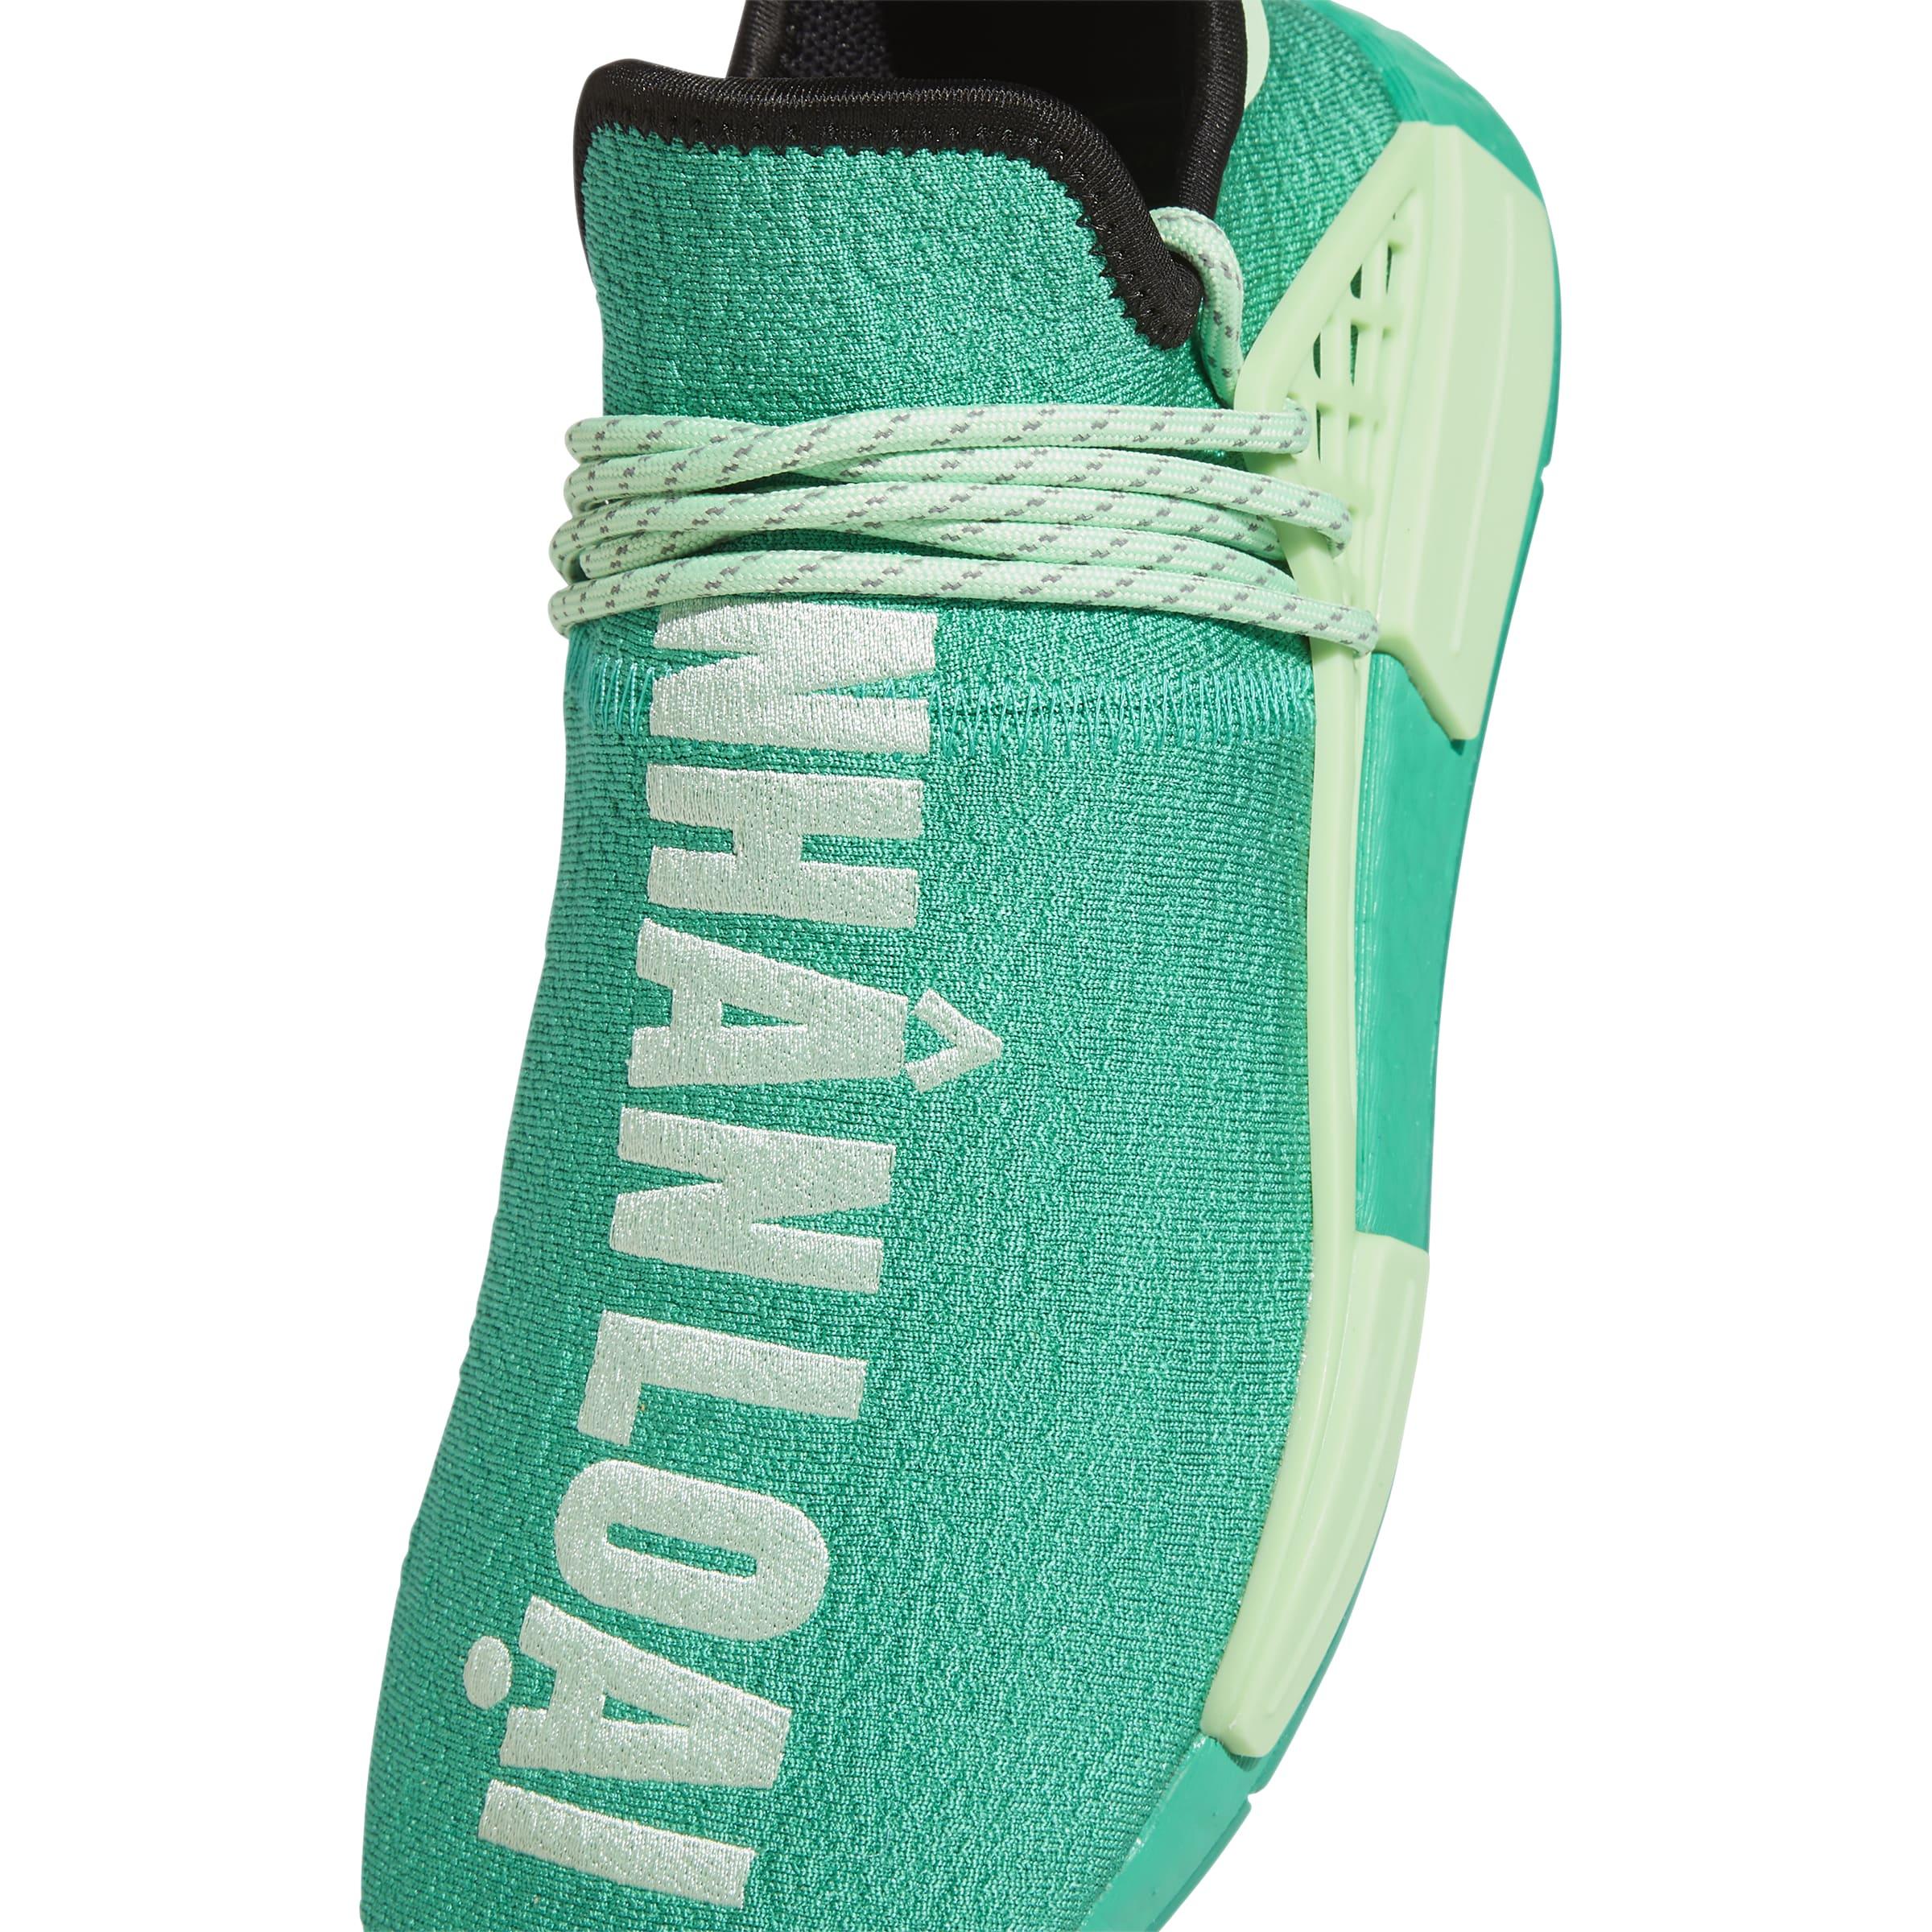 Pharrell x Adidas NMD Hu 'Green' FY0089 Top